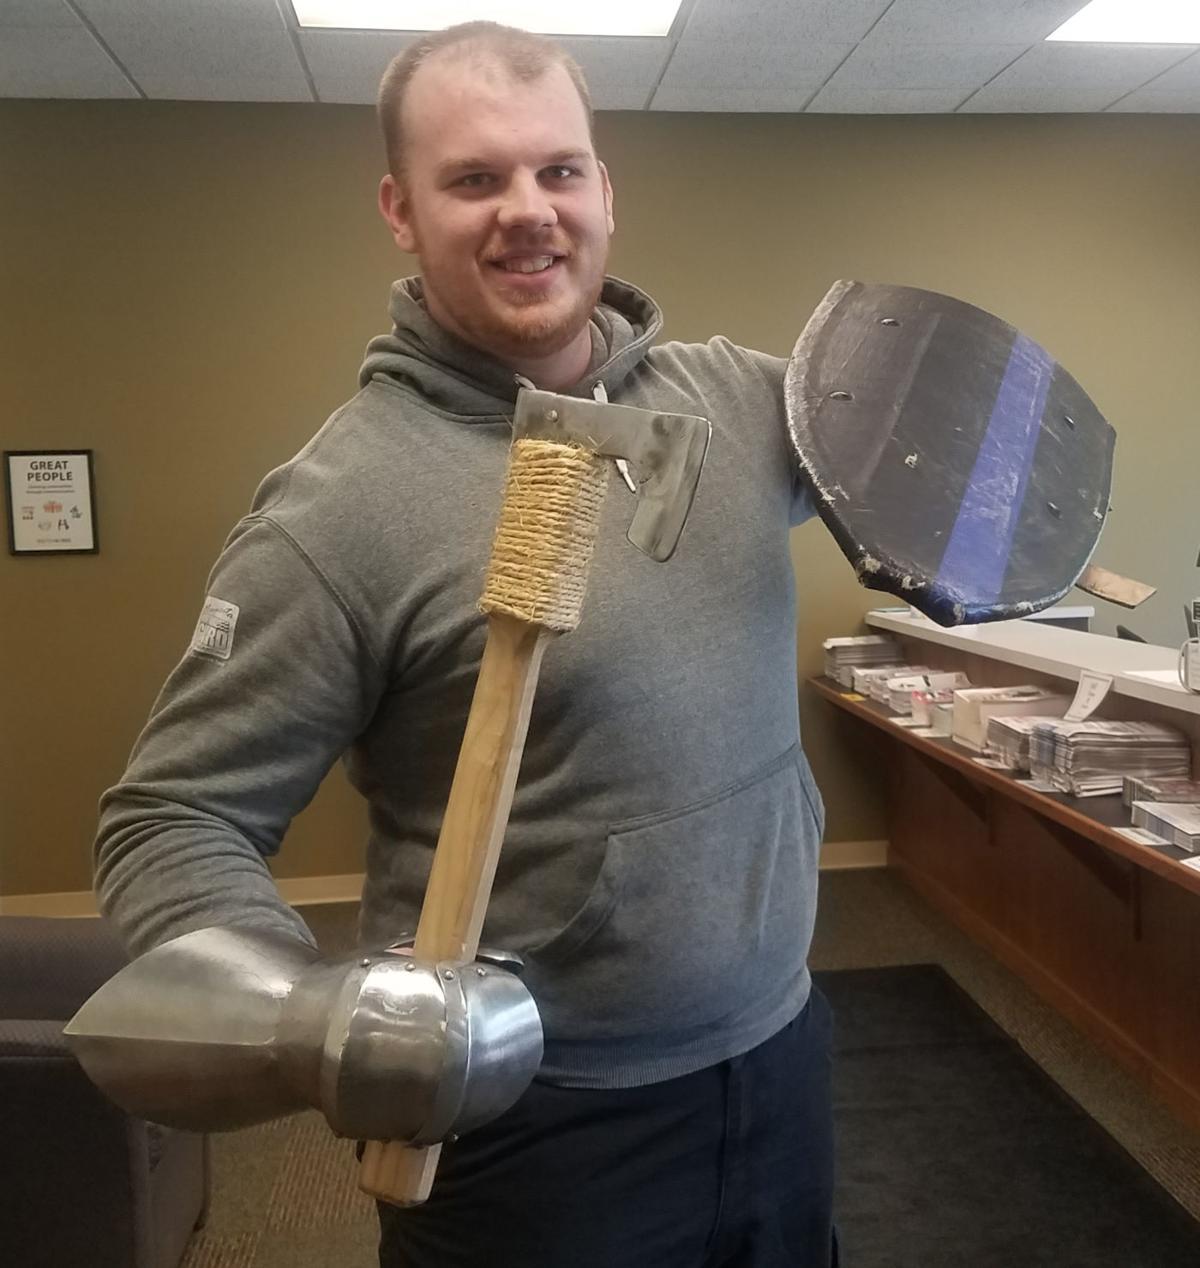 Moe with an axe